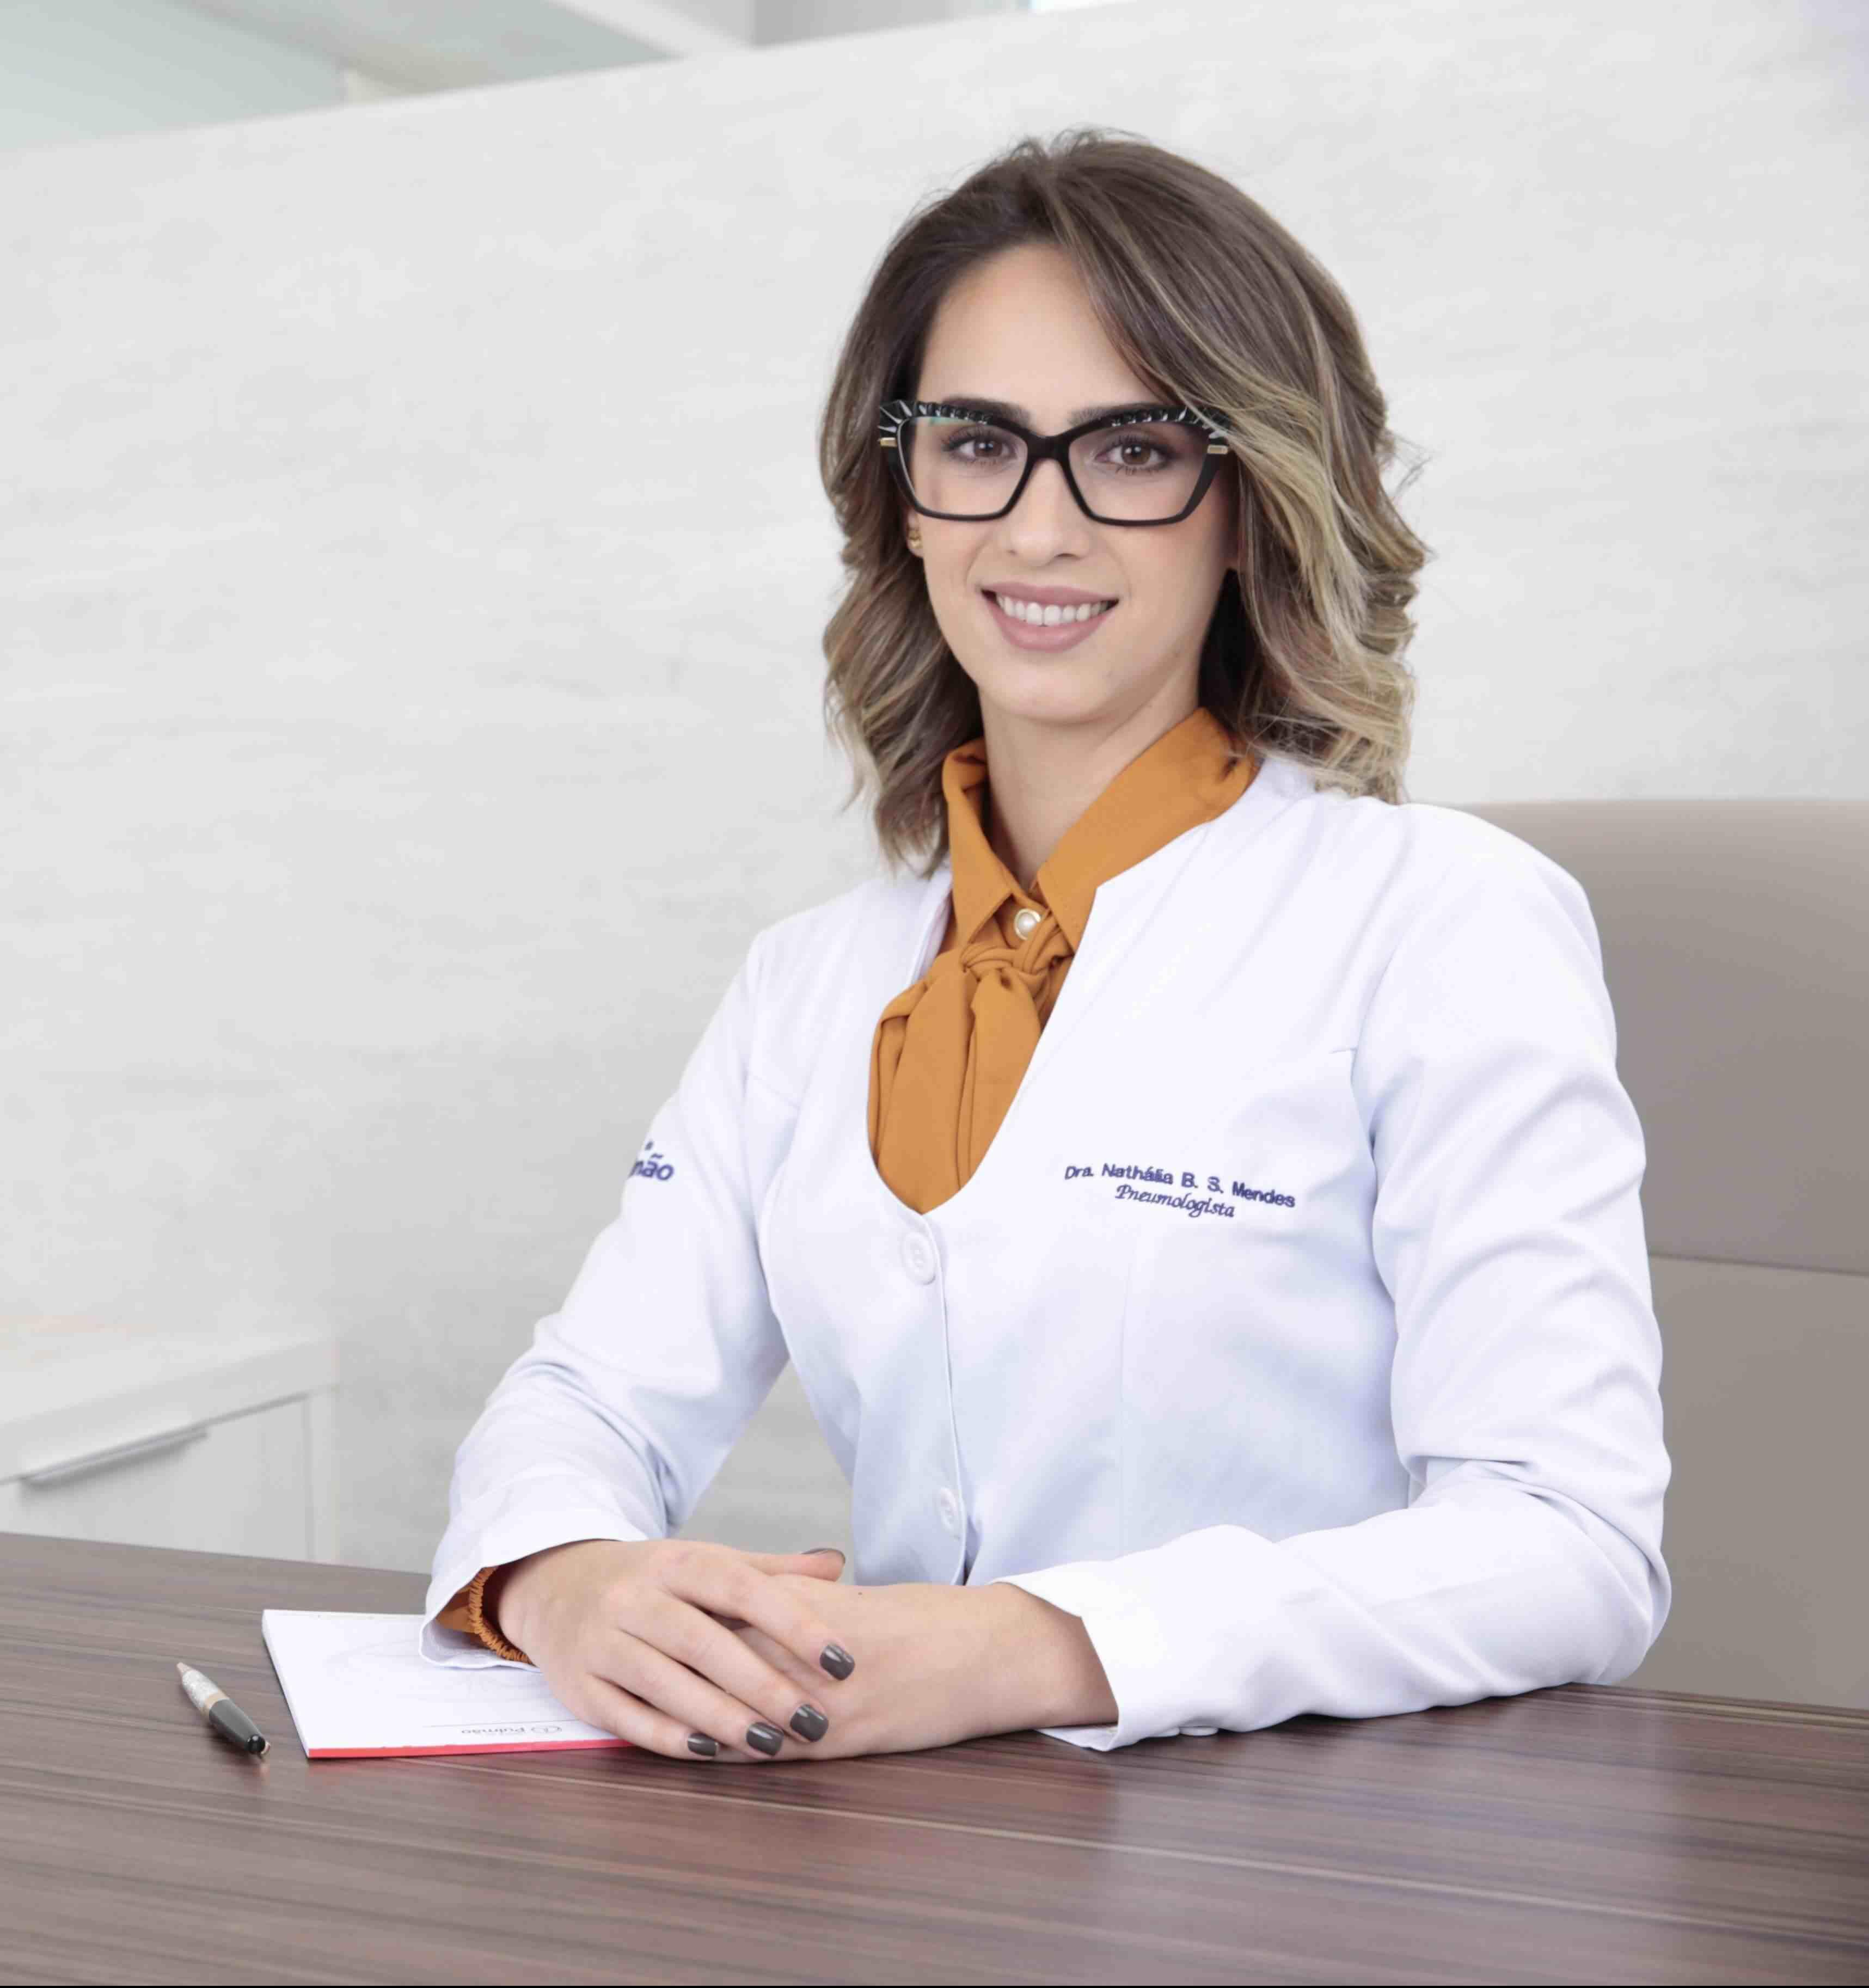 Dr. Nathalia Branco Mendes